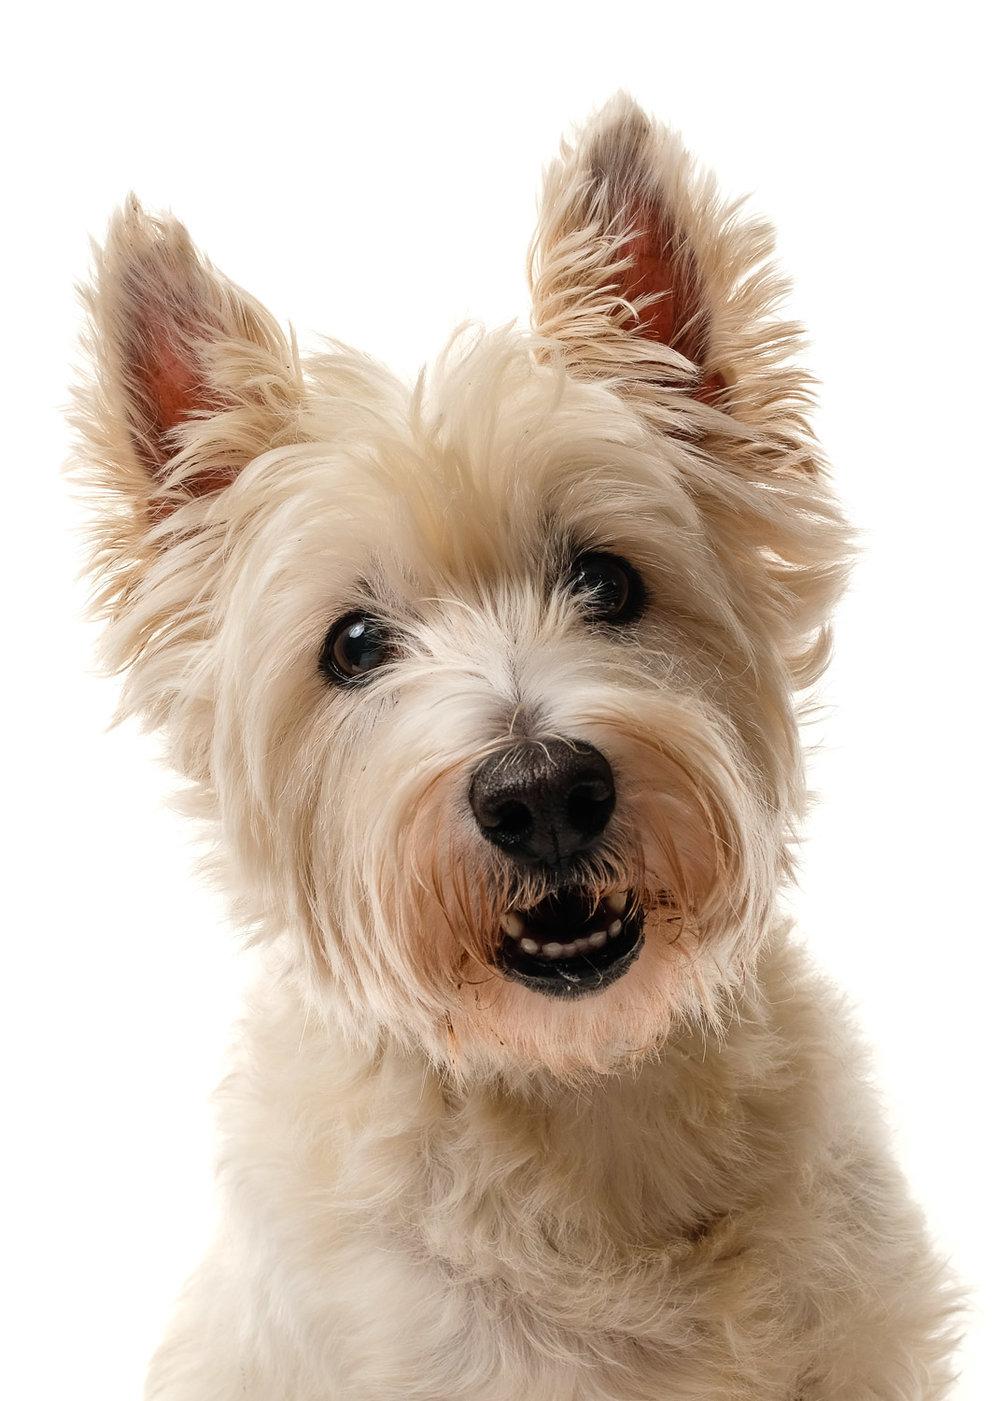 West Highland Terrier Westie dog photograph